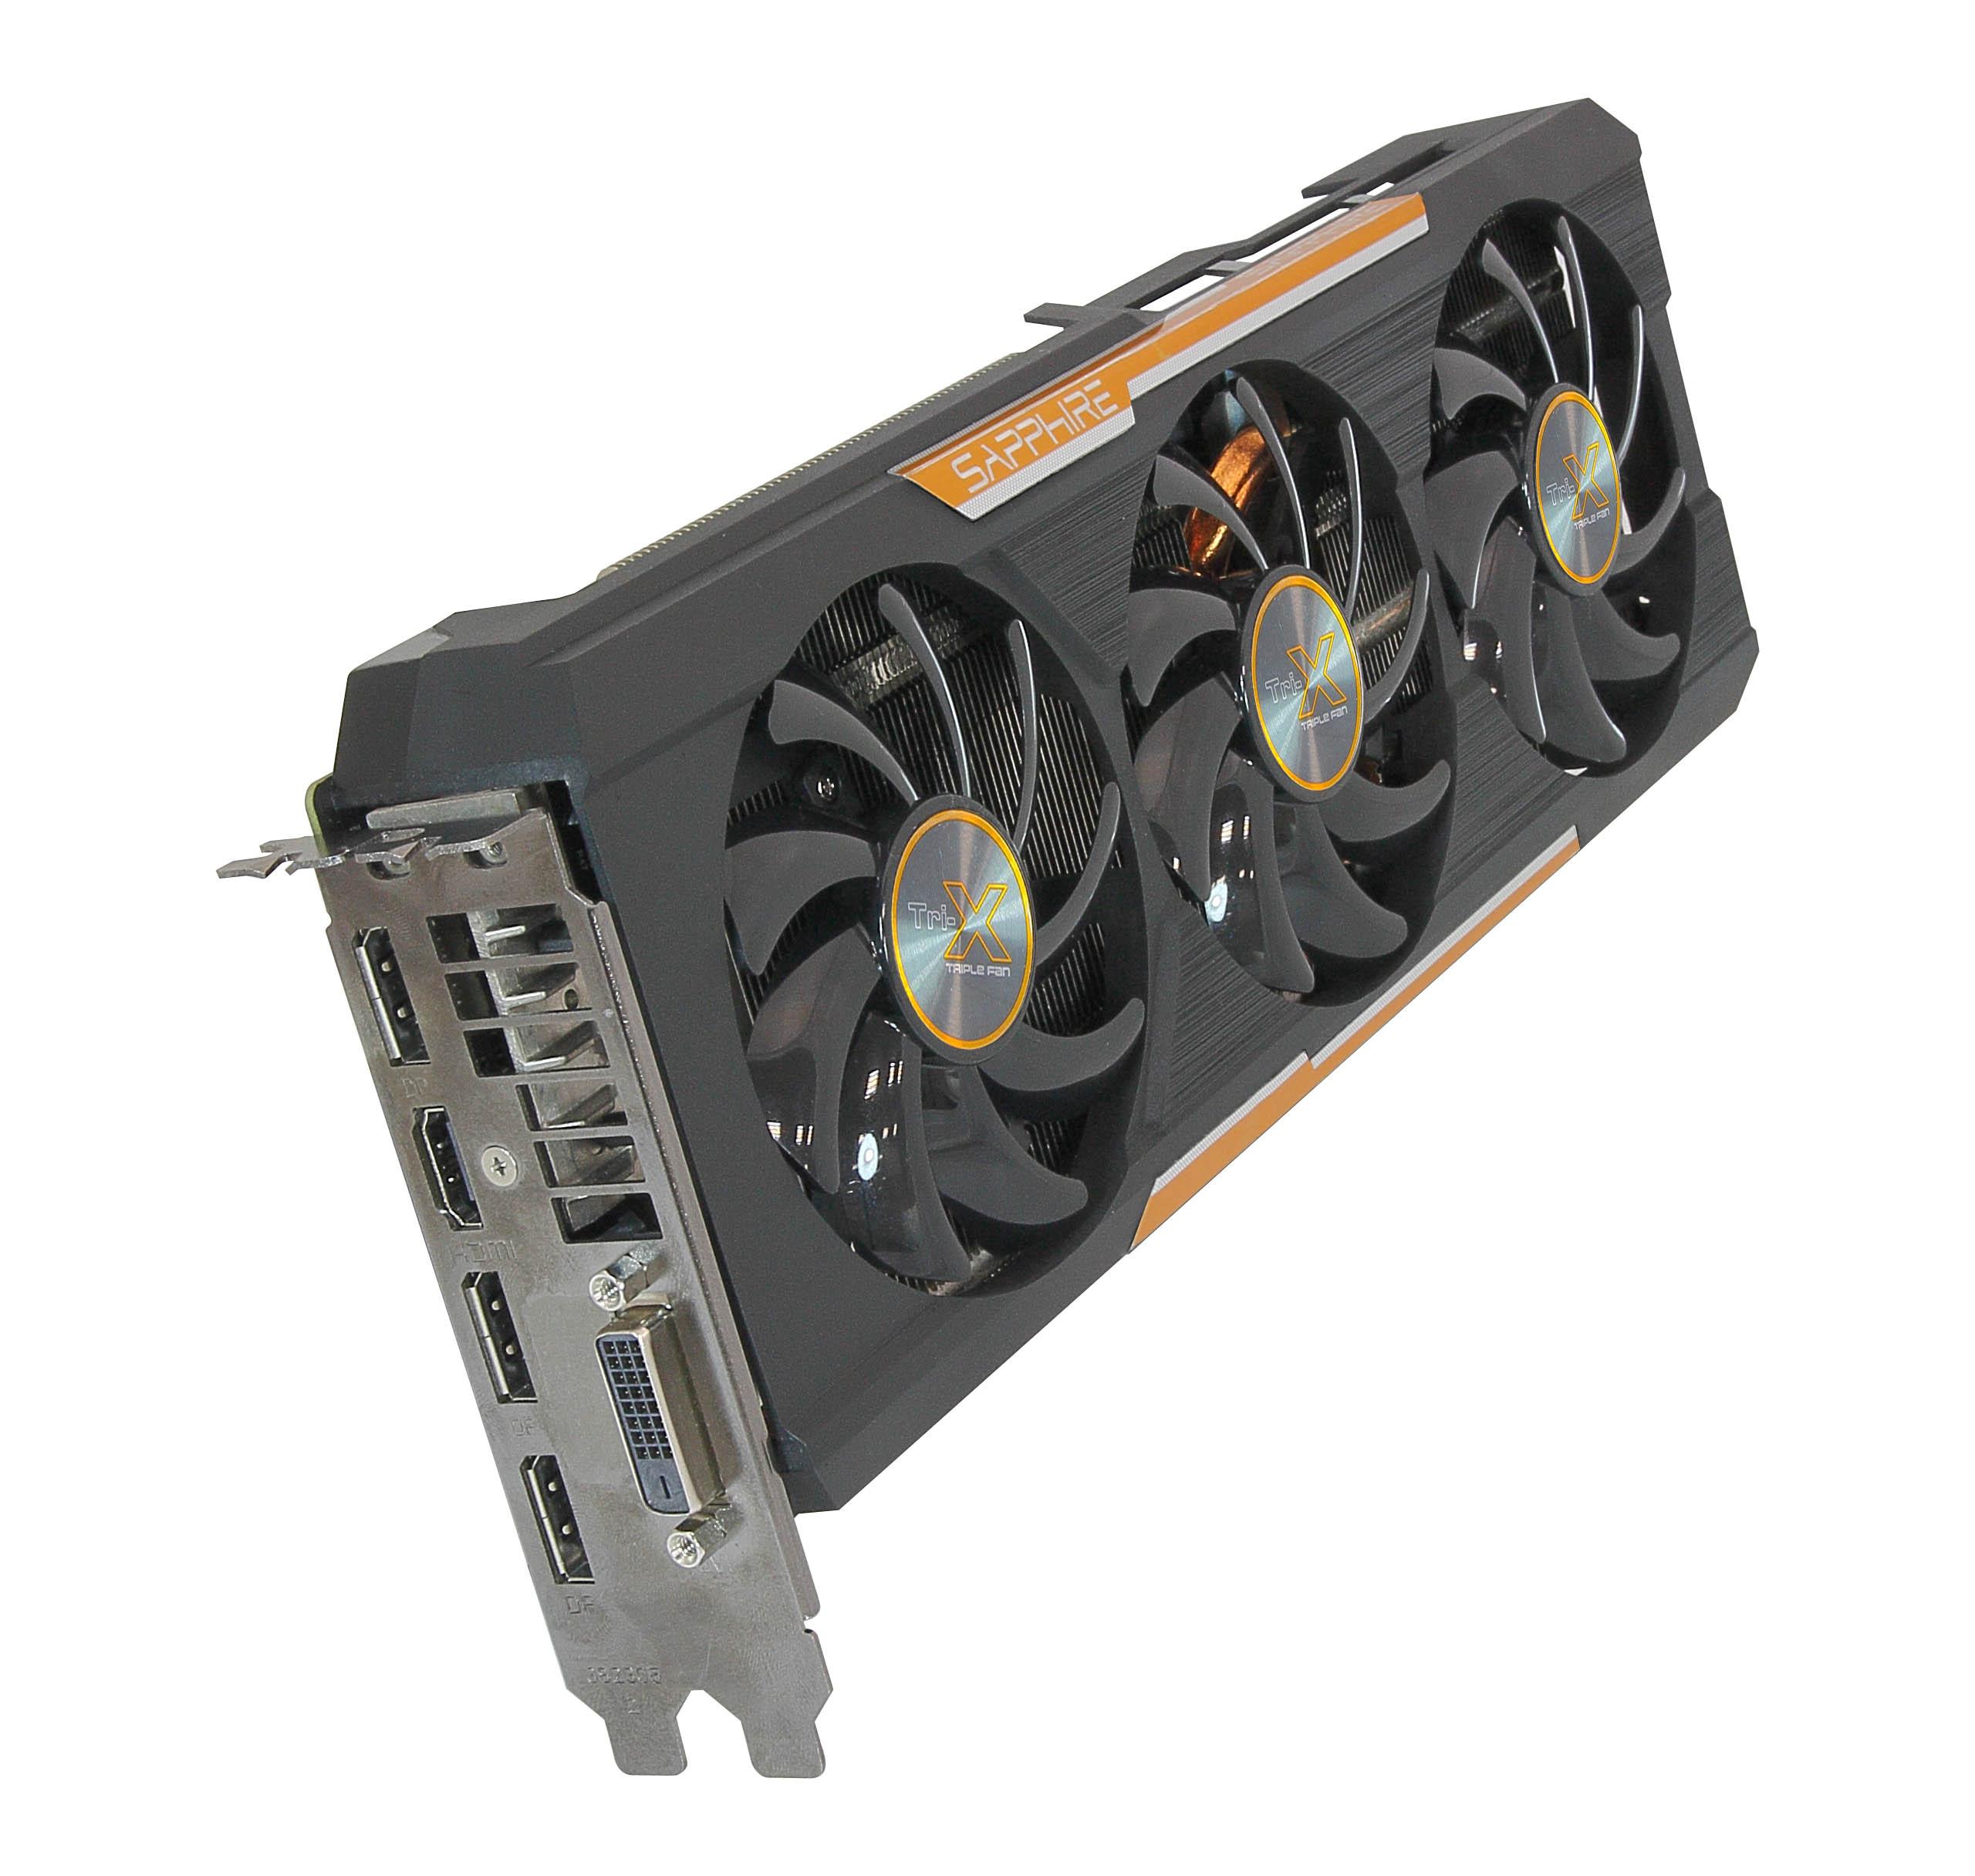 Radeon R9 390 Series: Return To Hawaii - AMD Launches Retail